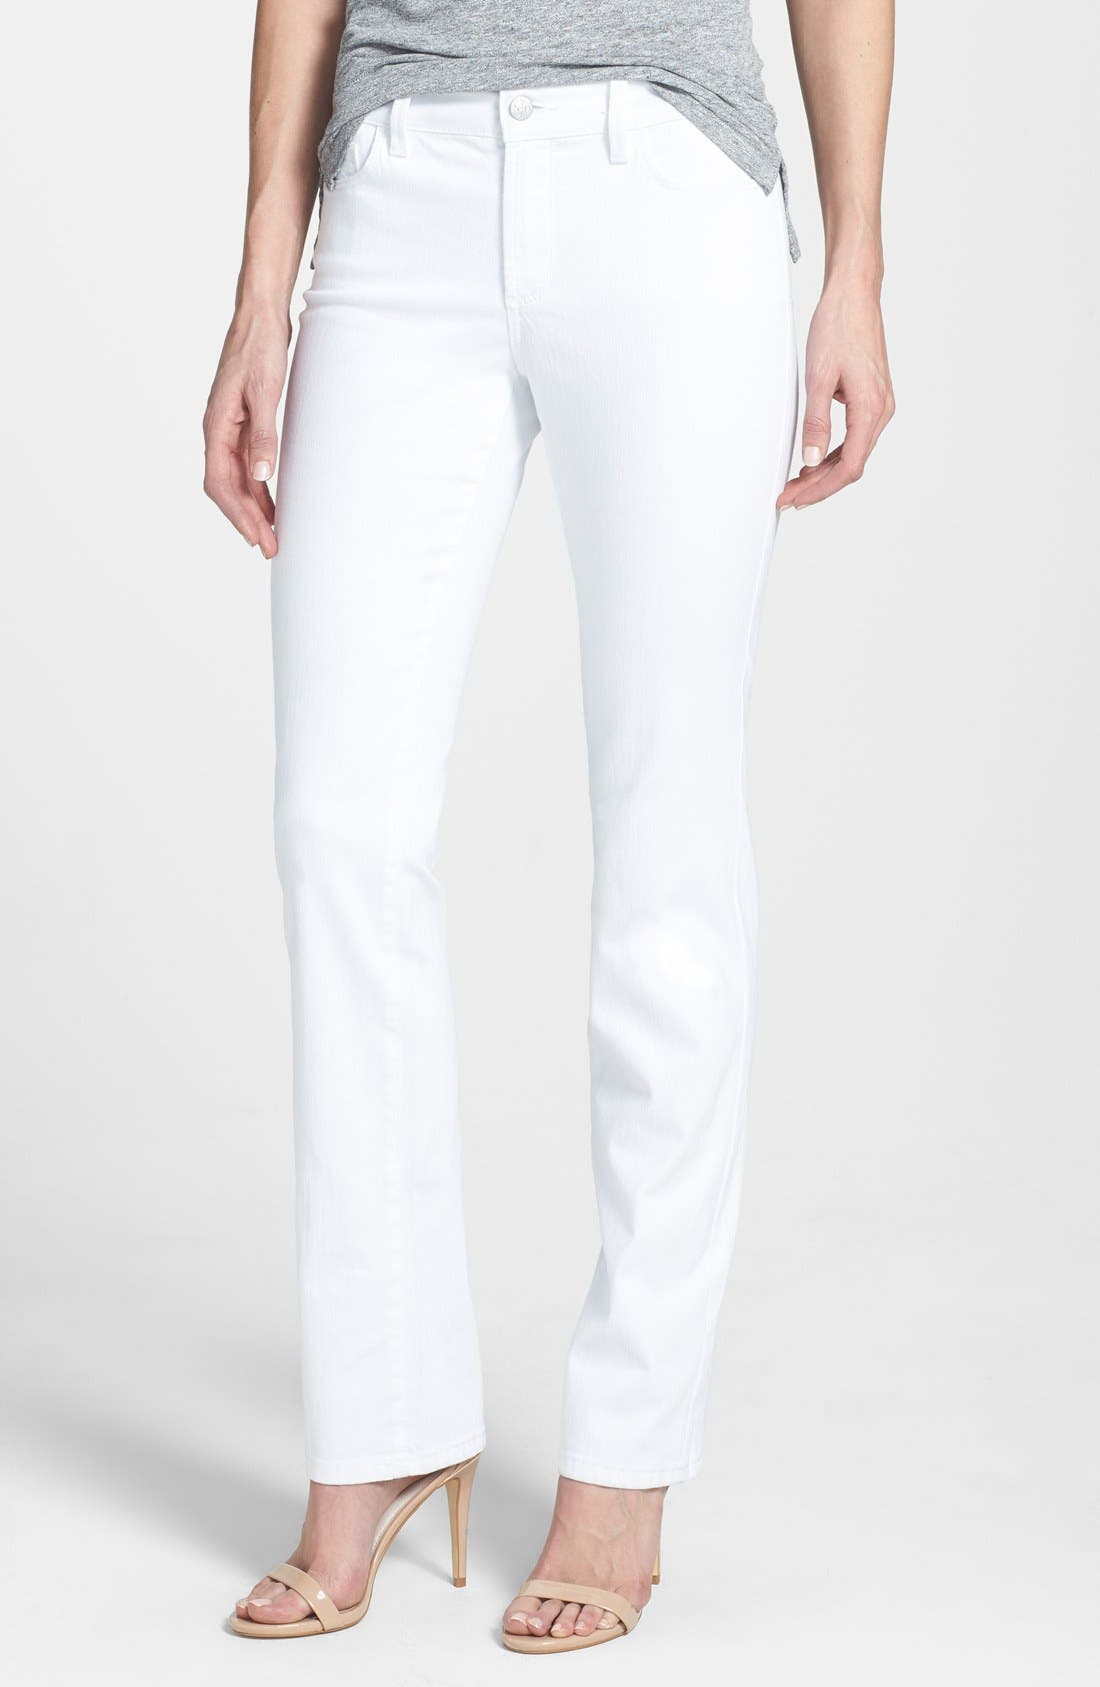 Alternate Image 1 Selected - NYDJ 'Marilyn' Stretch Straight Leg Jeans (Optic White) (Regular & Petite)